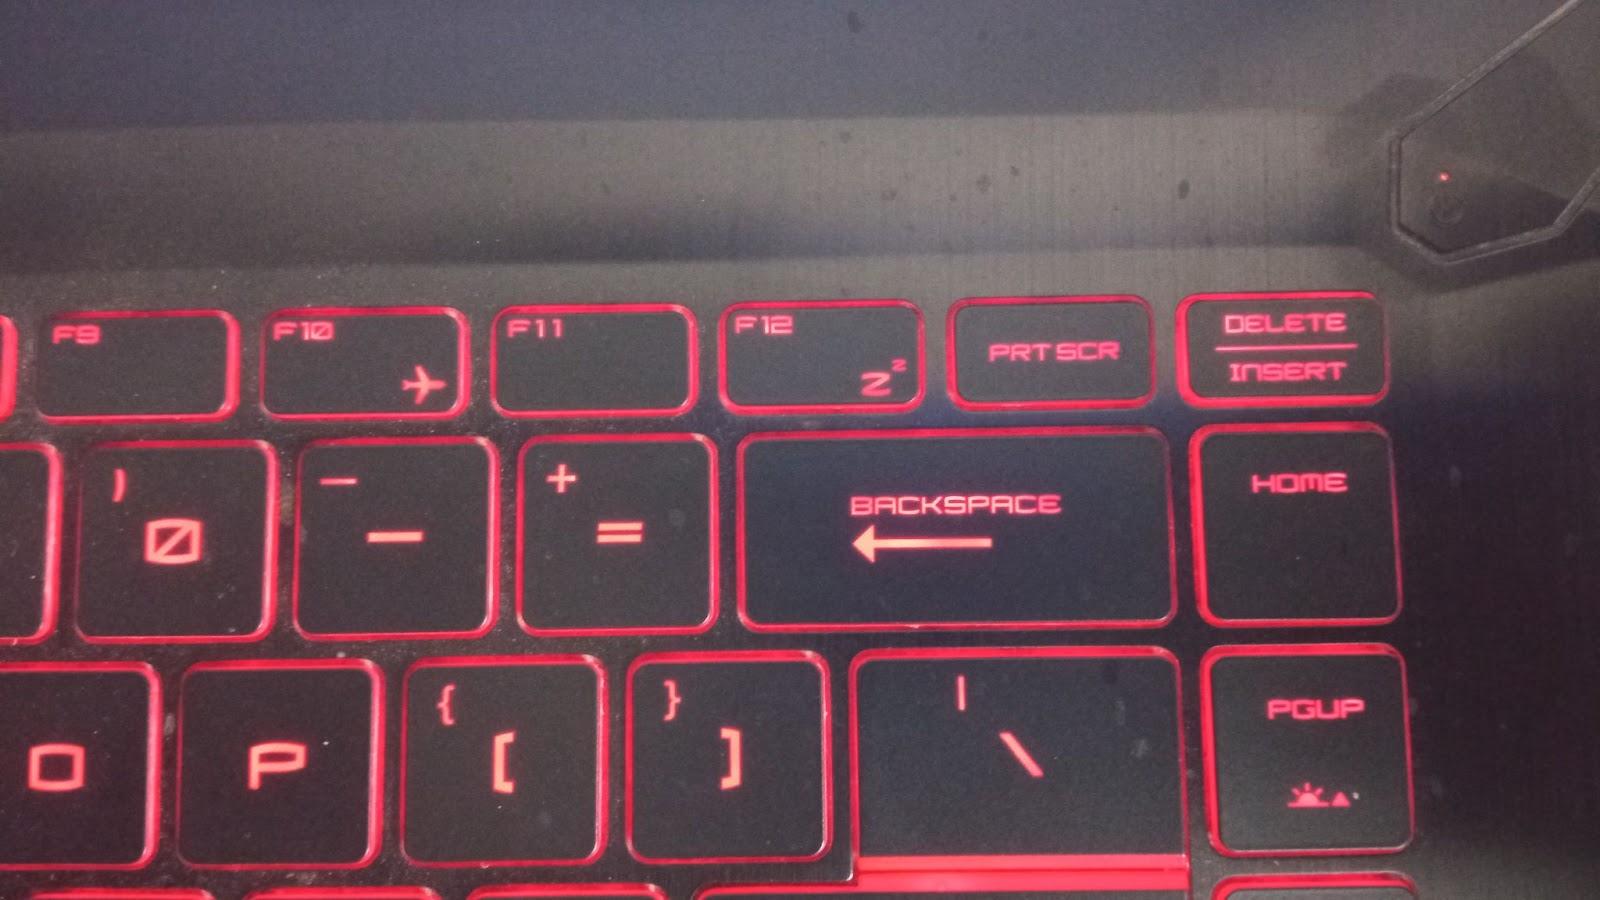 F10, F11 and Delete keys on a laptop keyboard